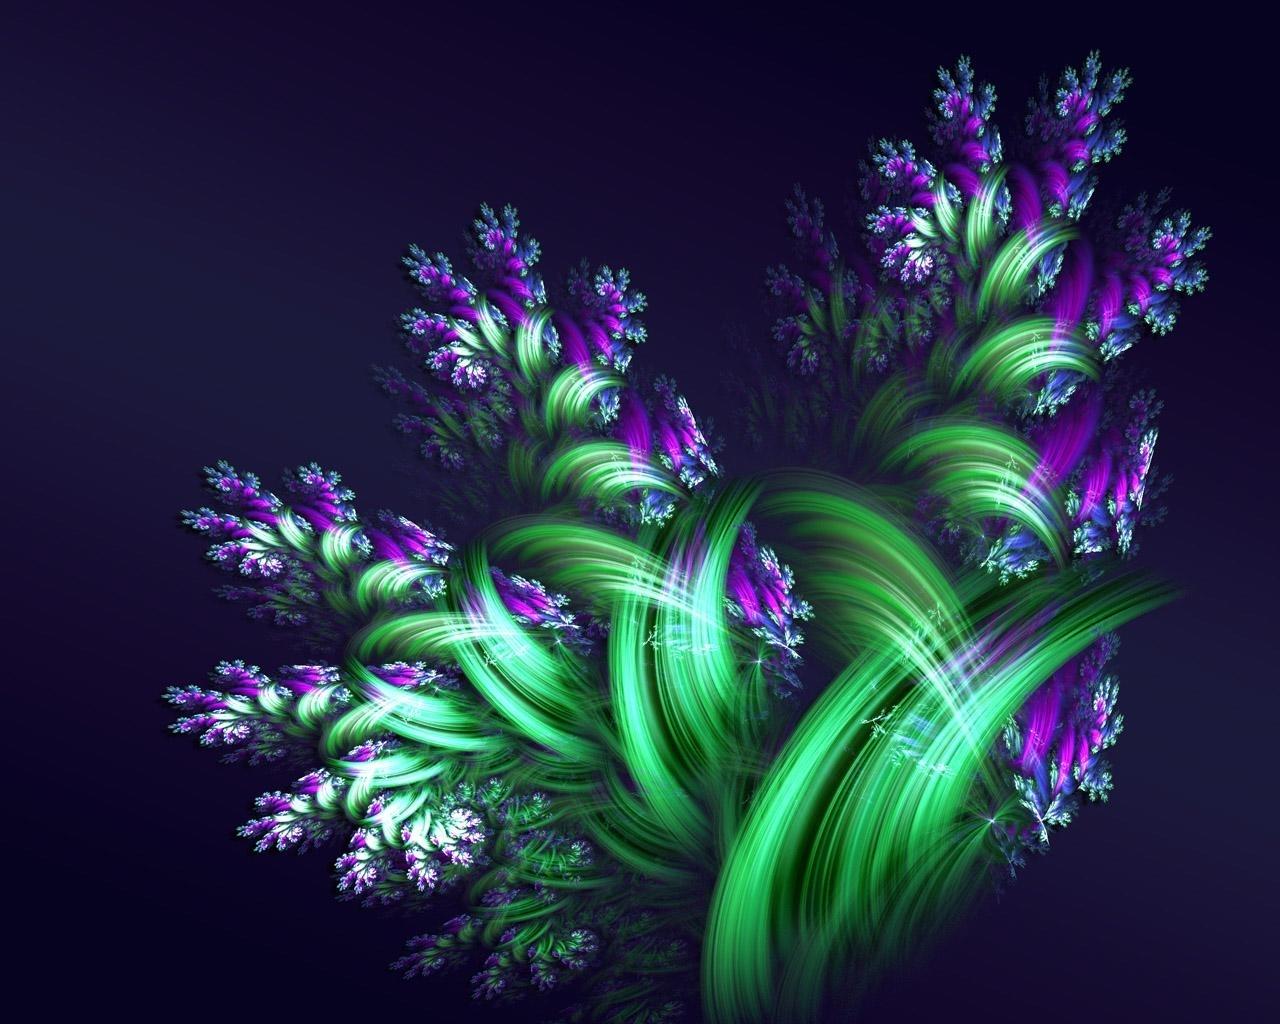 Funny Purple Flowers Hd Wallpaper: HQ Wallpapers Arena: Purple Green Fractal Flower